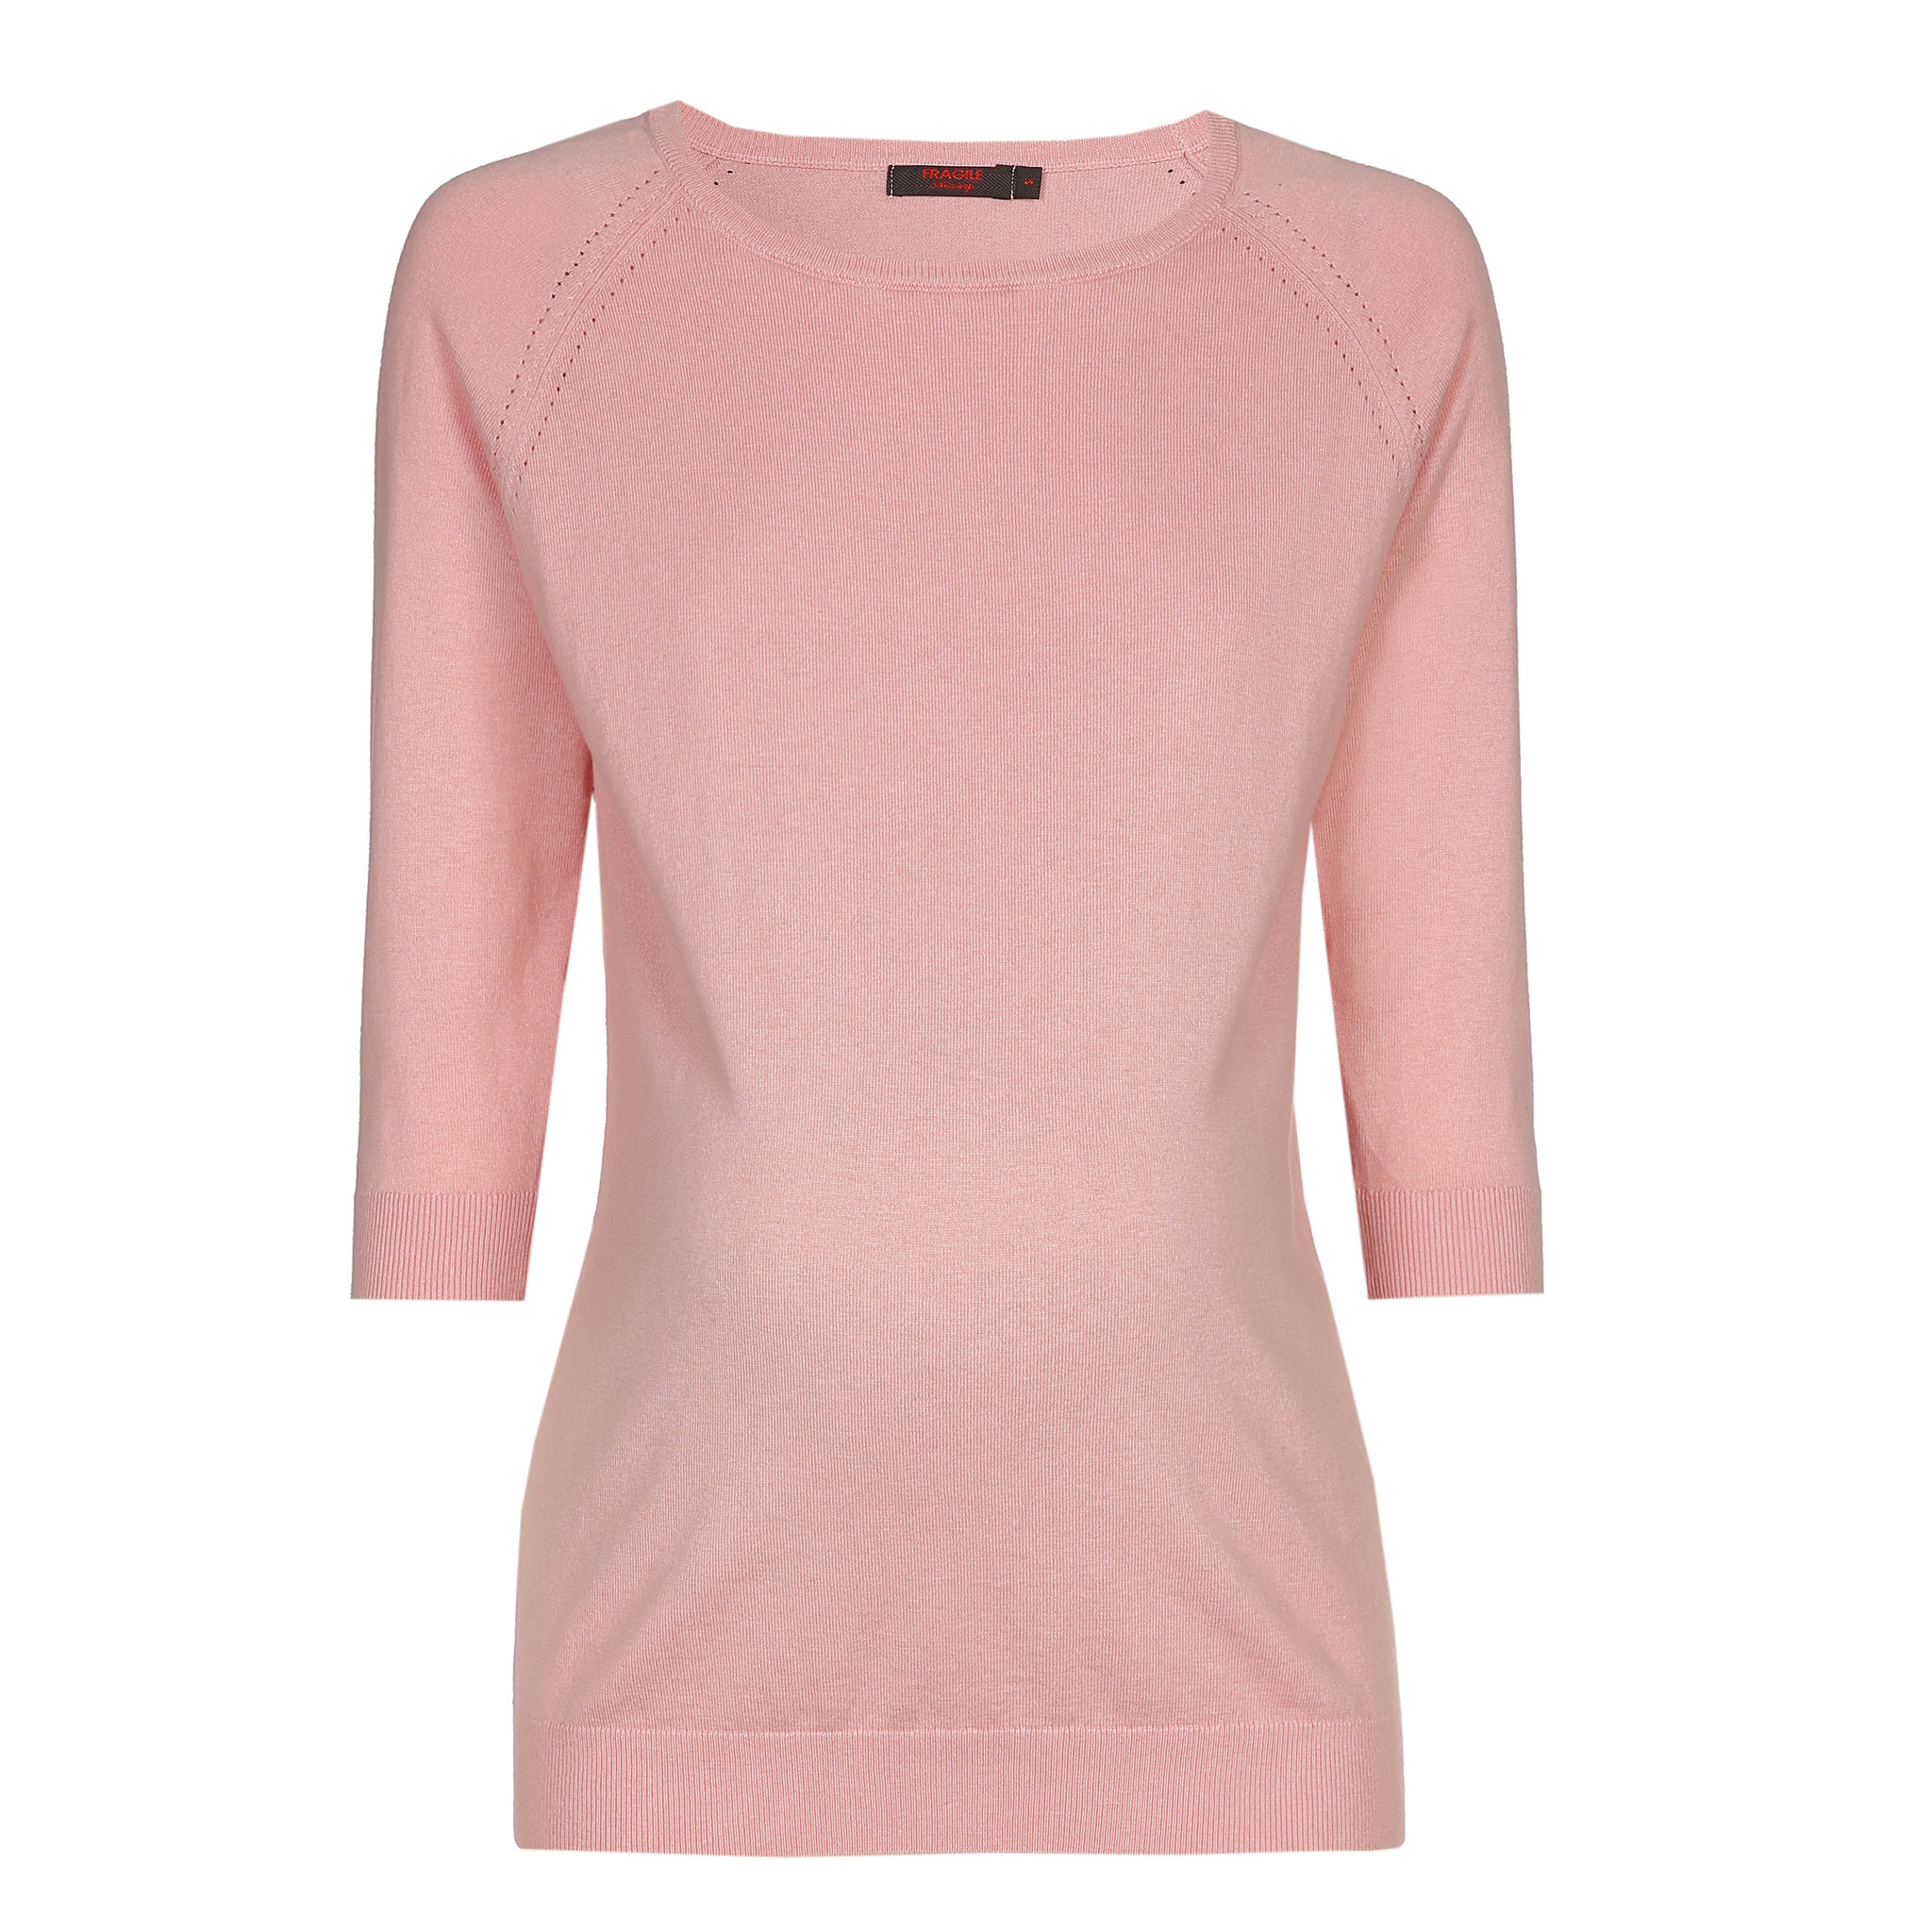 soft sweater - soft salmon-2